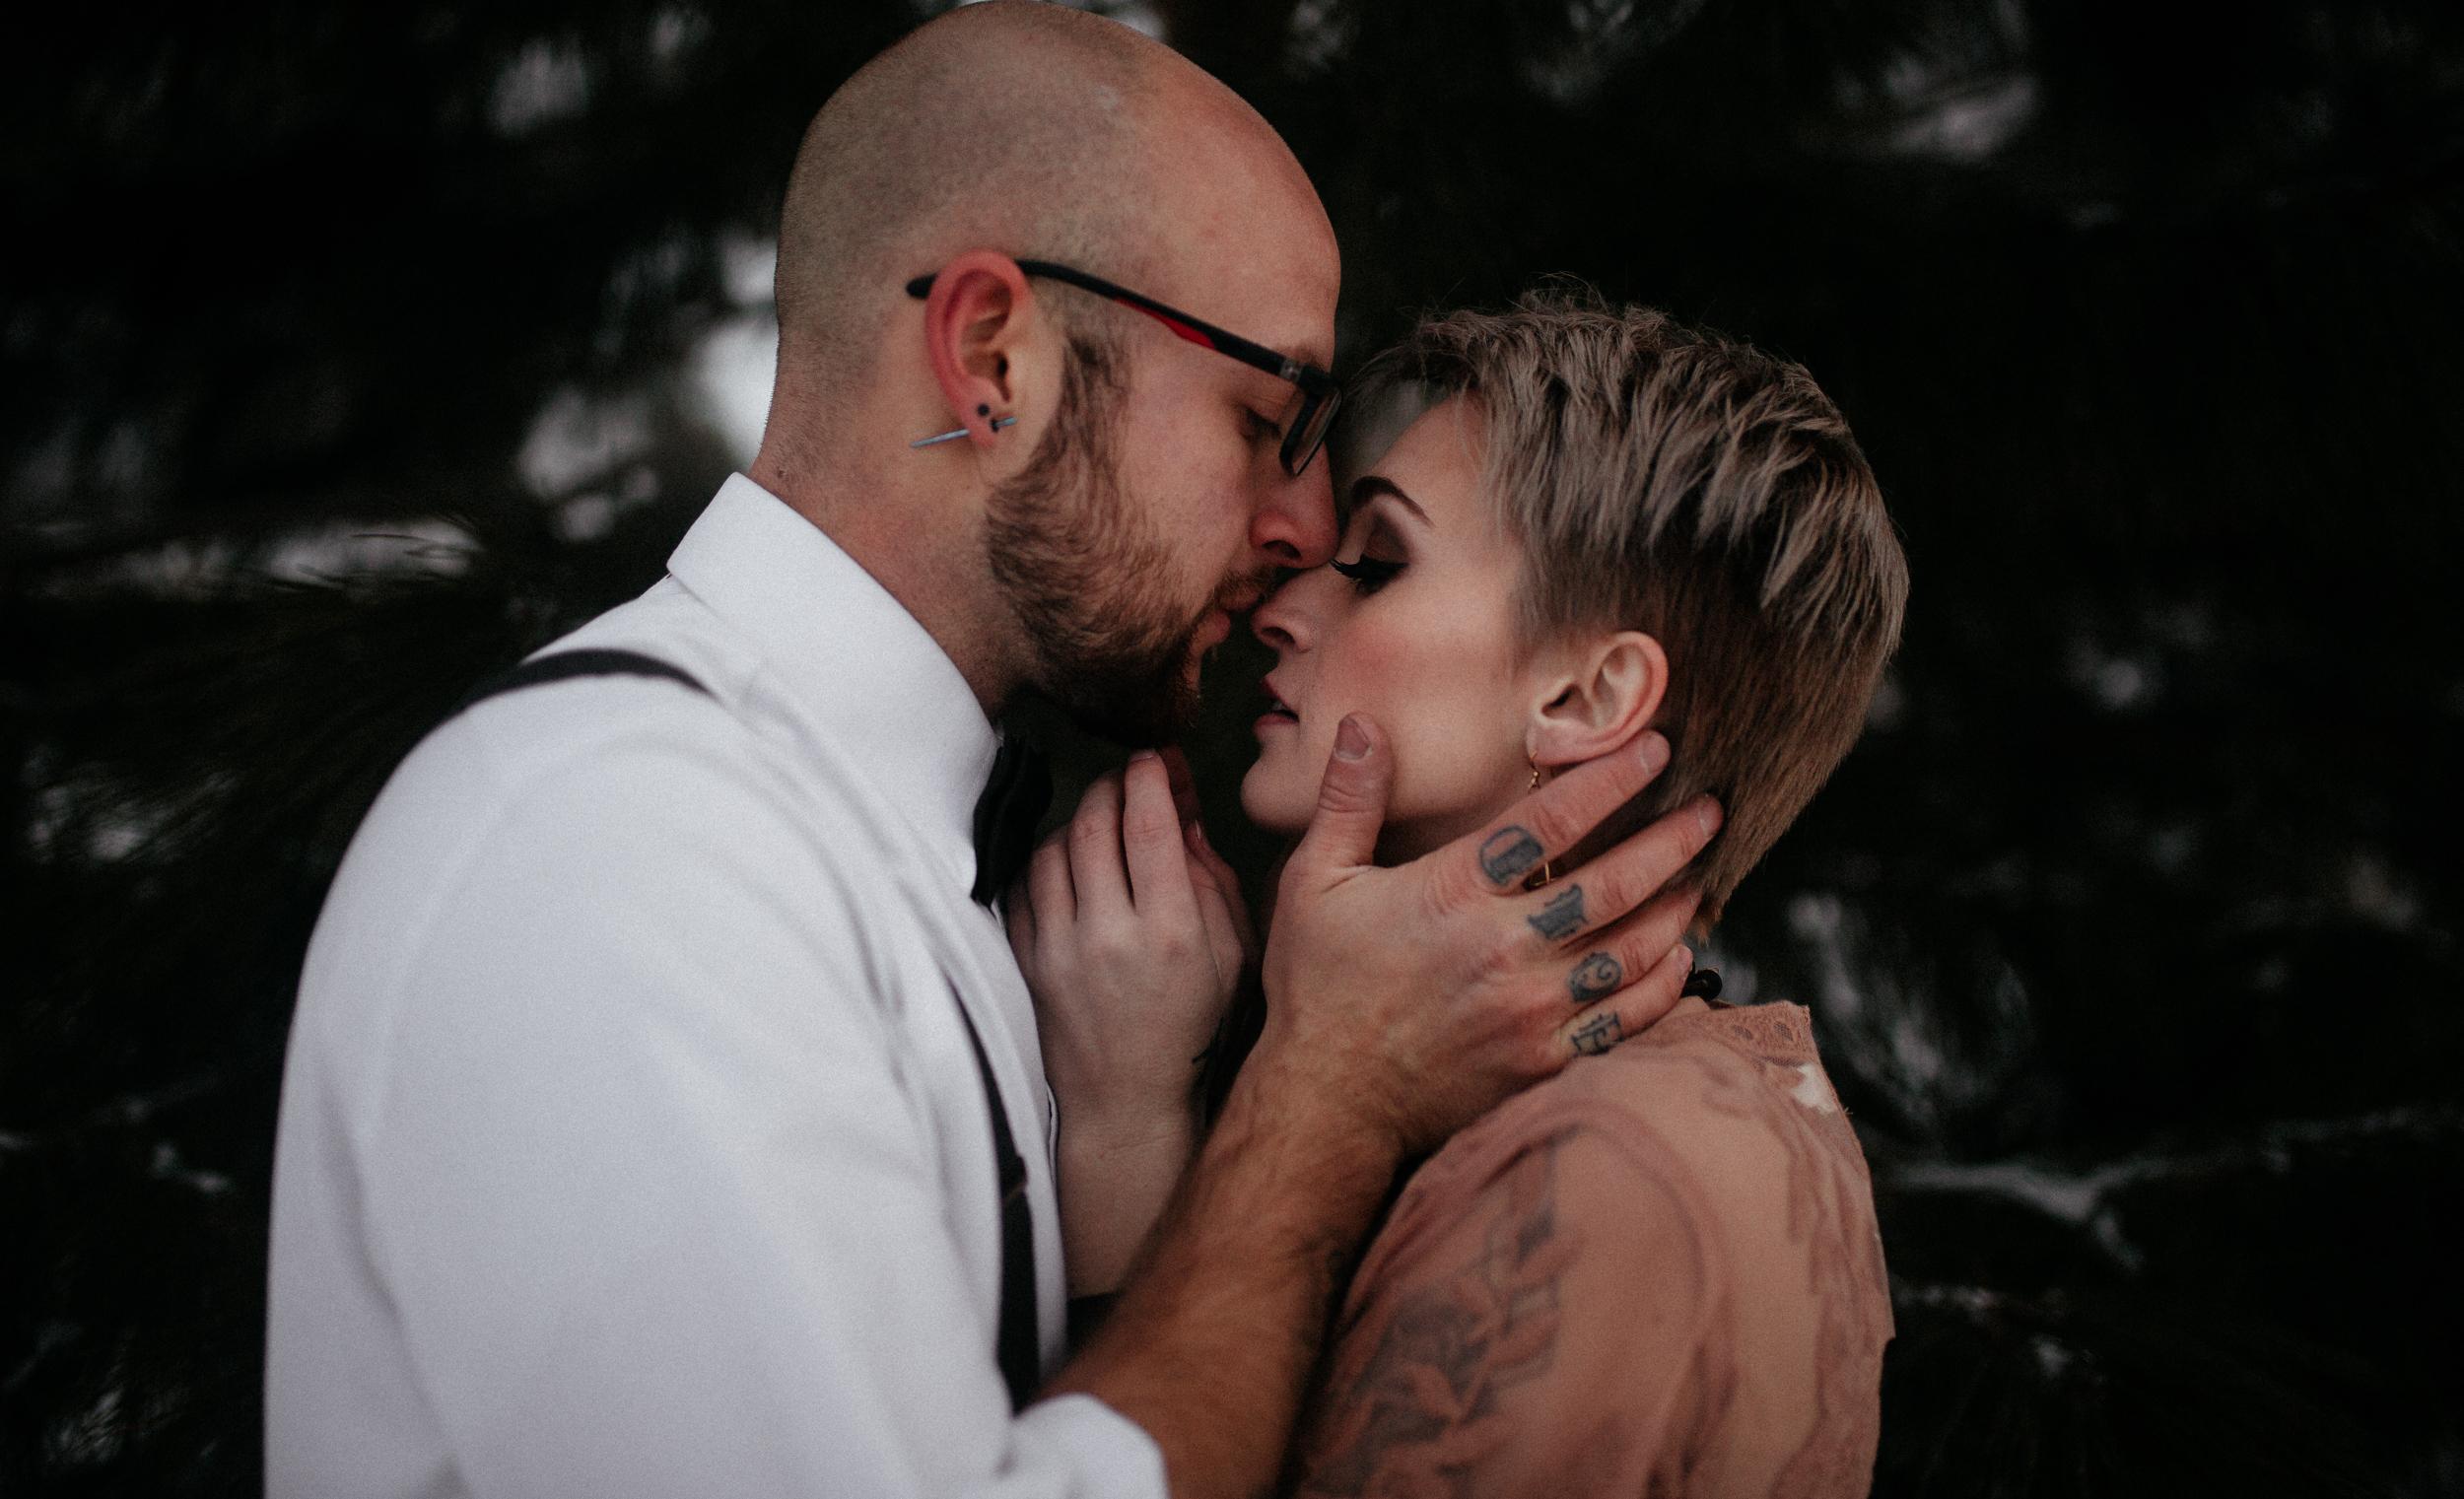 The Hatches   Tennessee Wedding and Elopement Photographers   memphis-tennessee-wedding-and-elopement-photographers-photography-unique-adventure-weird-creative-utah-colorado-washington-arizona-wedding-photographer-moody-romantic-cozy-journalistic-whimsical